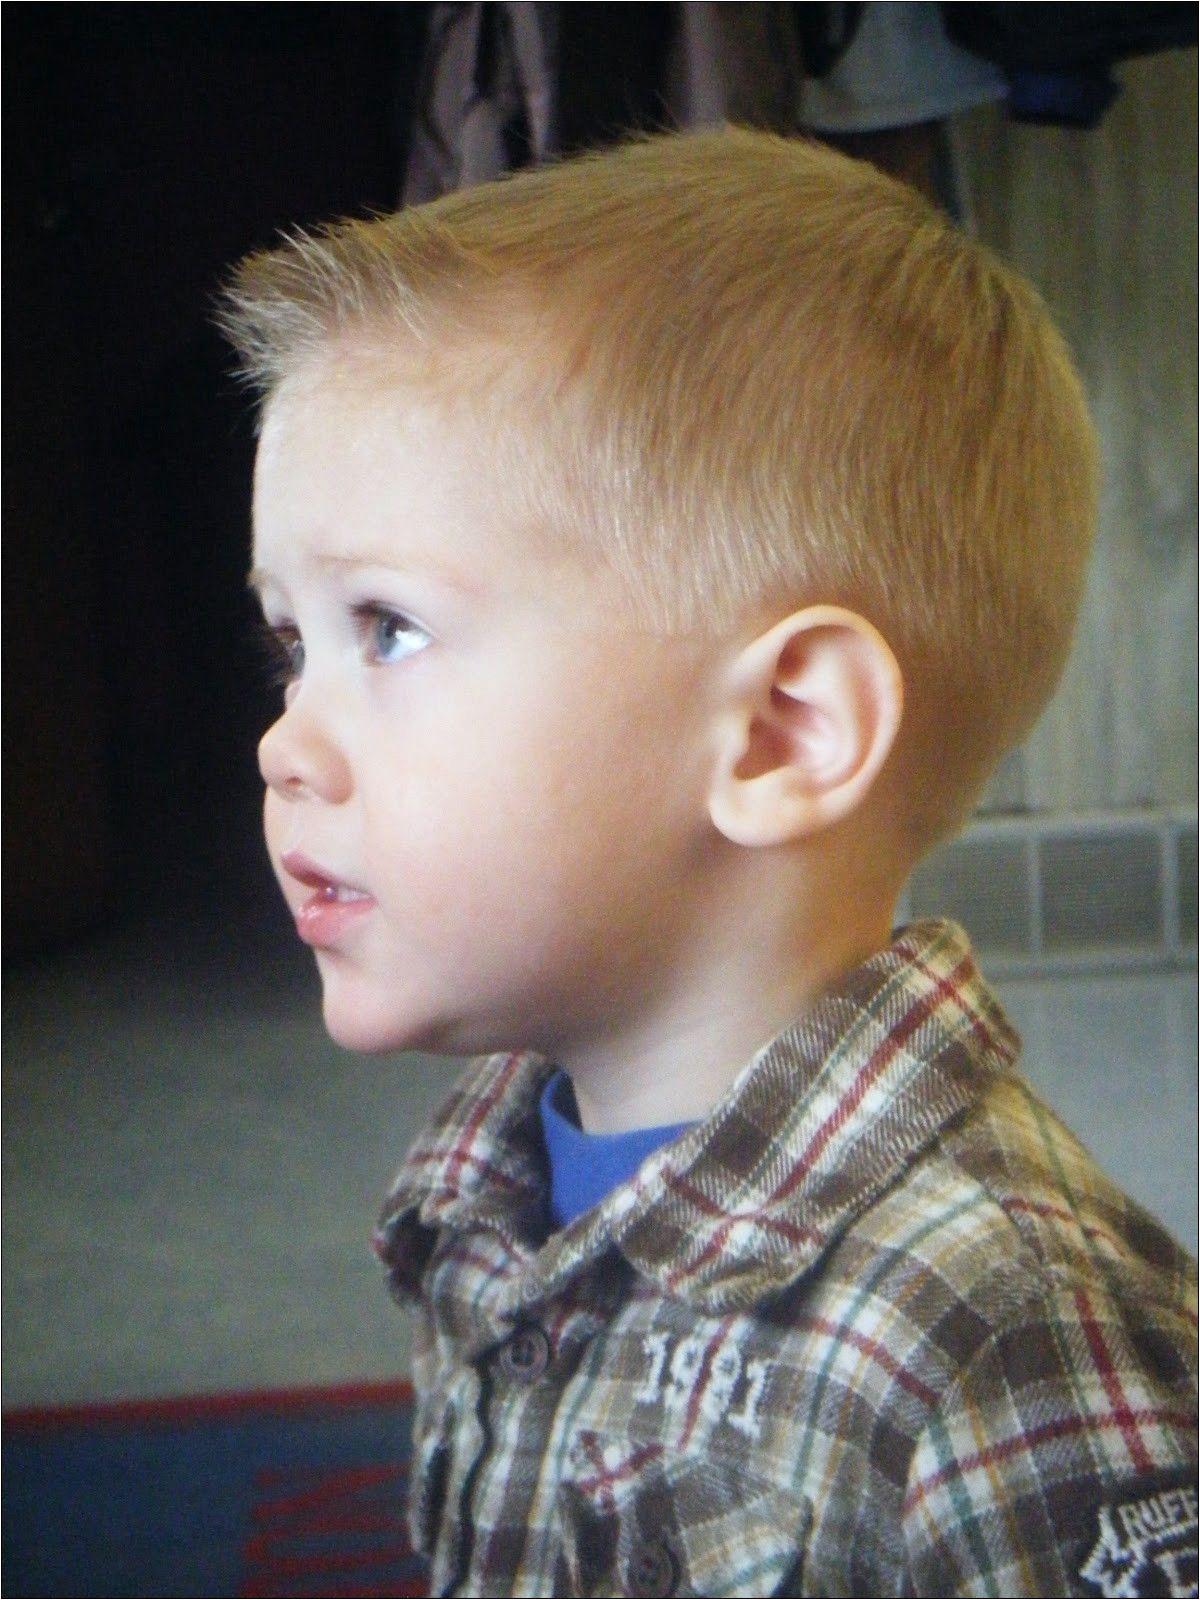 3 Year Old Haircut